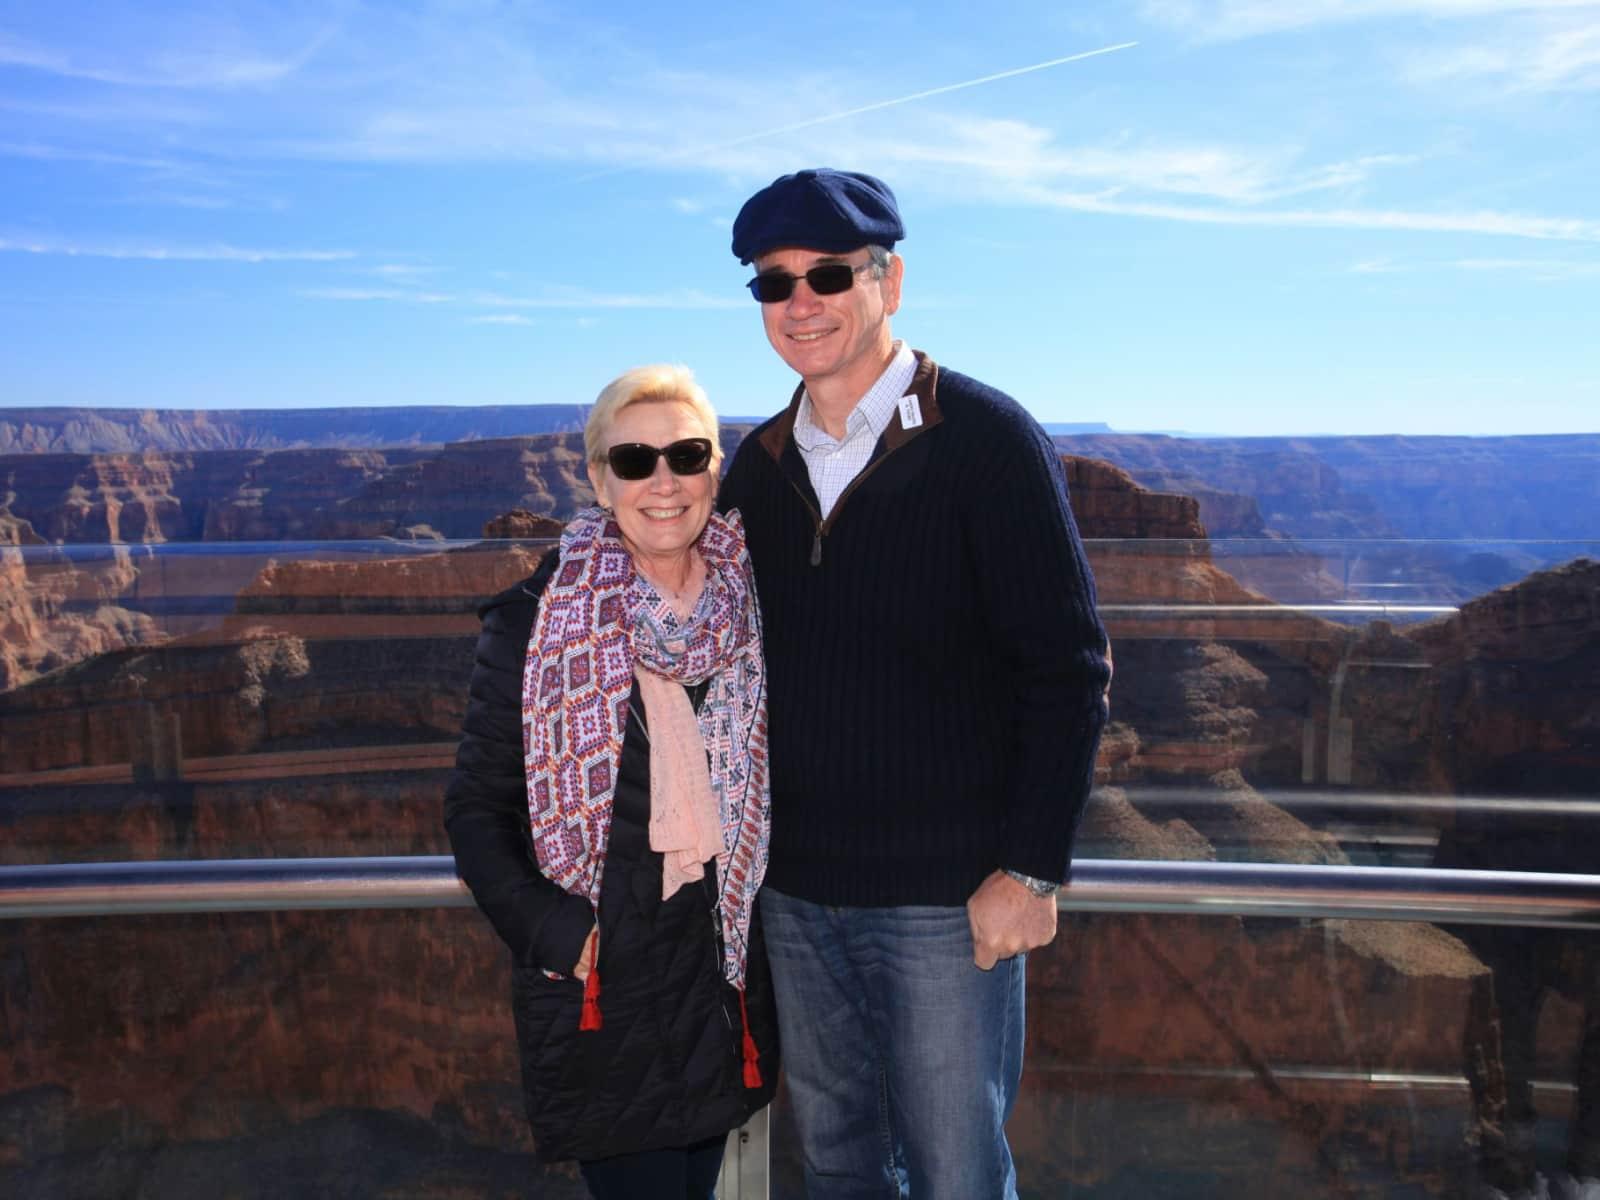 Kathy & Peter from Brisbane, Queensland, Australia